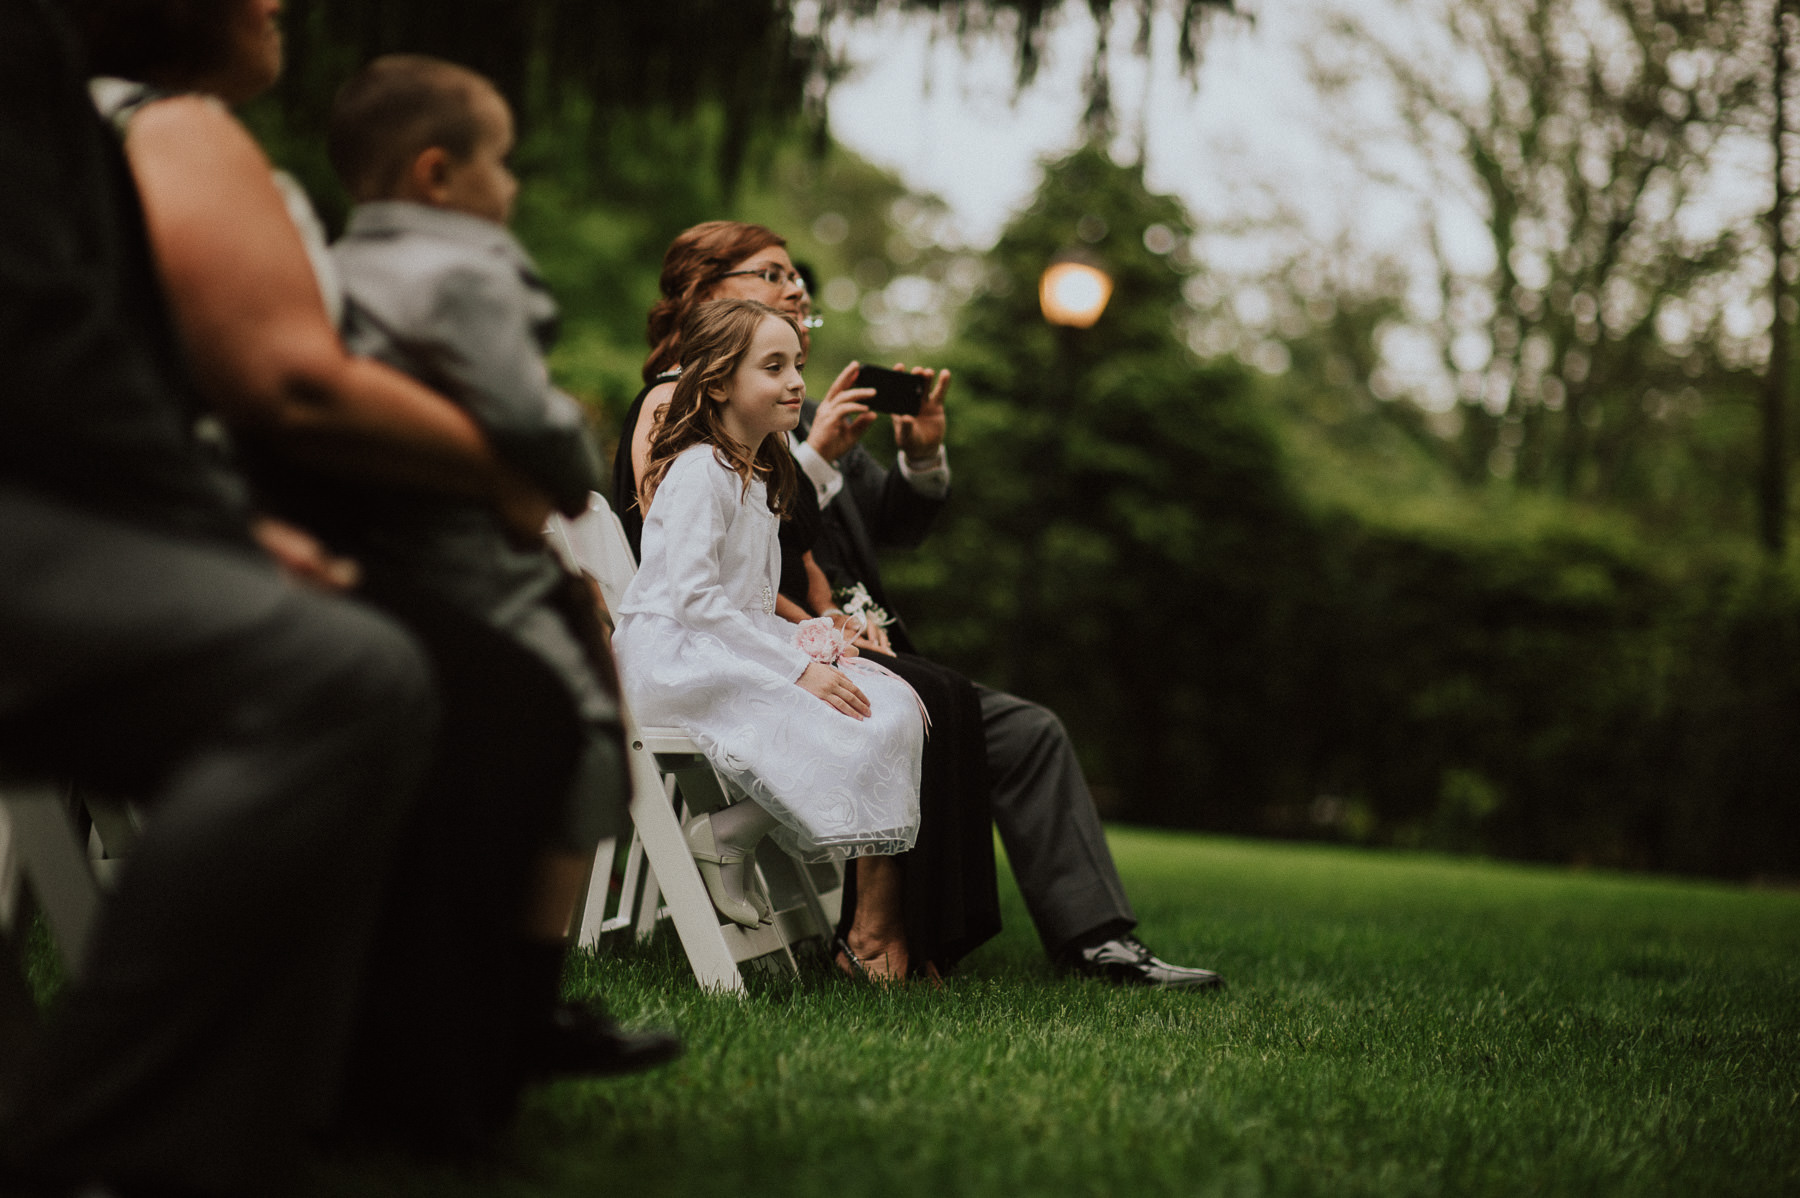 appleford-estate-wedding-photography-62.jpg